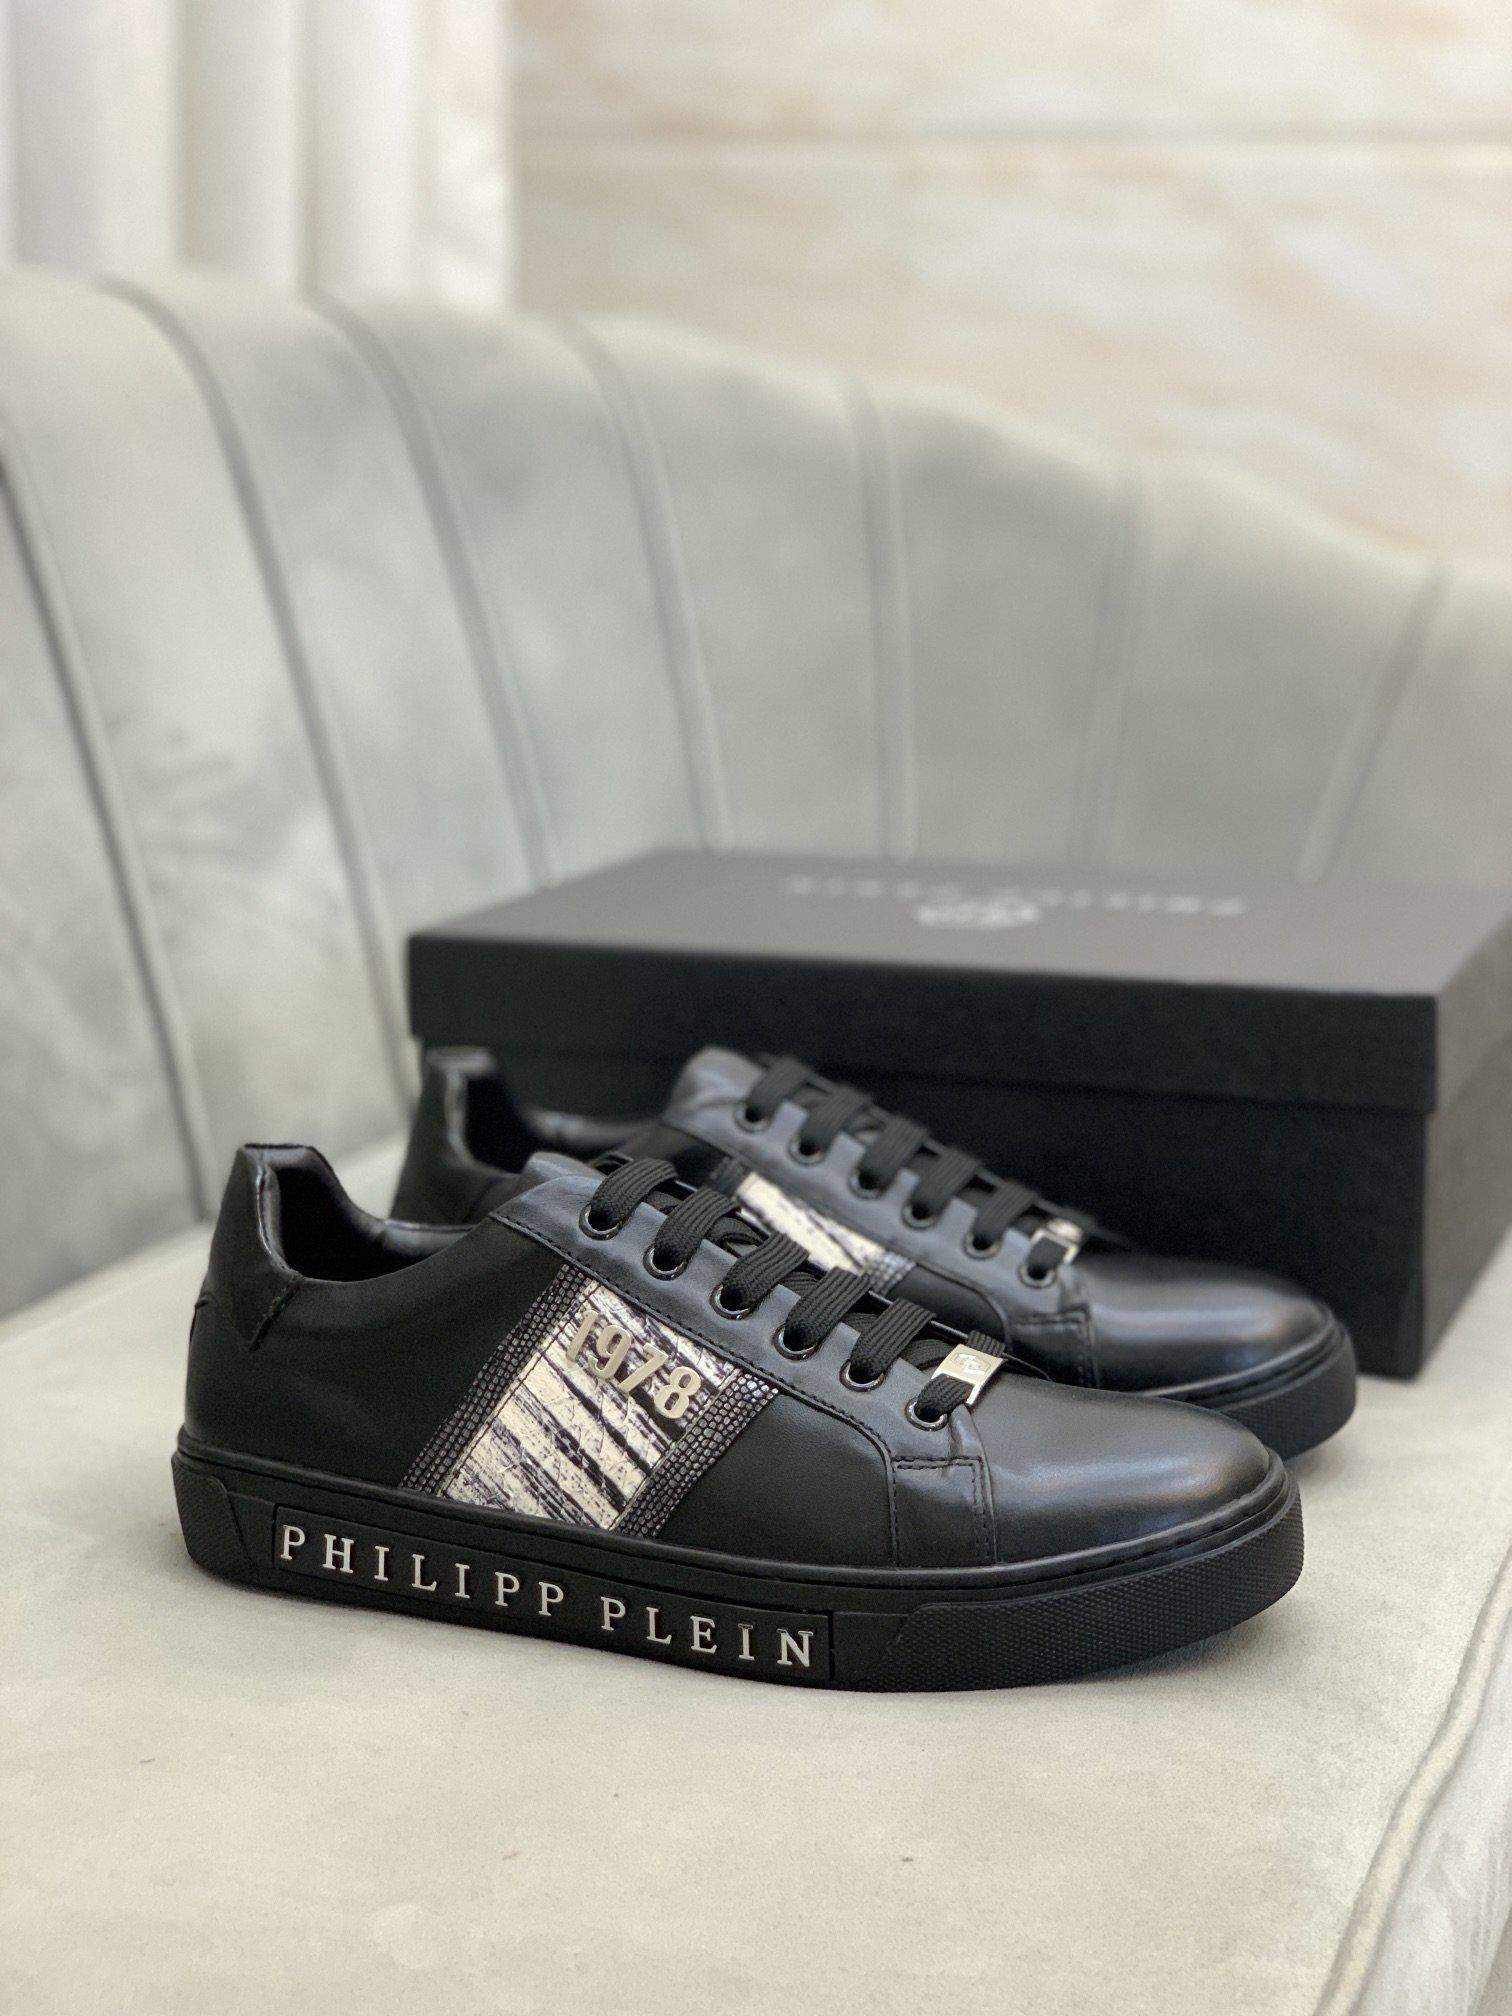 PP*菲利普普莱*低帮休闲鞋正码码数